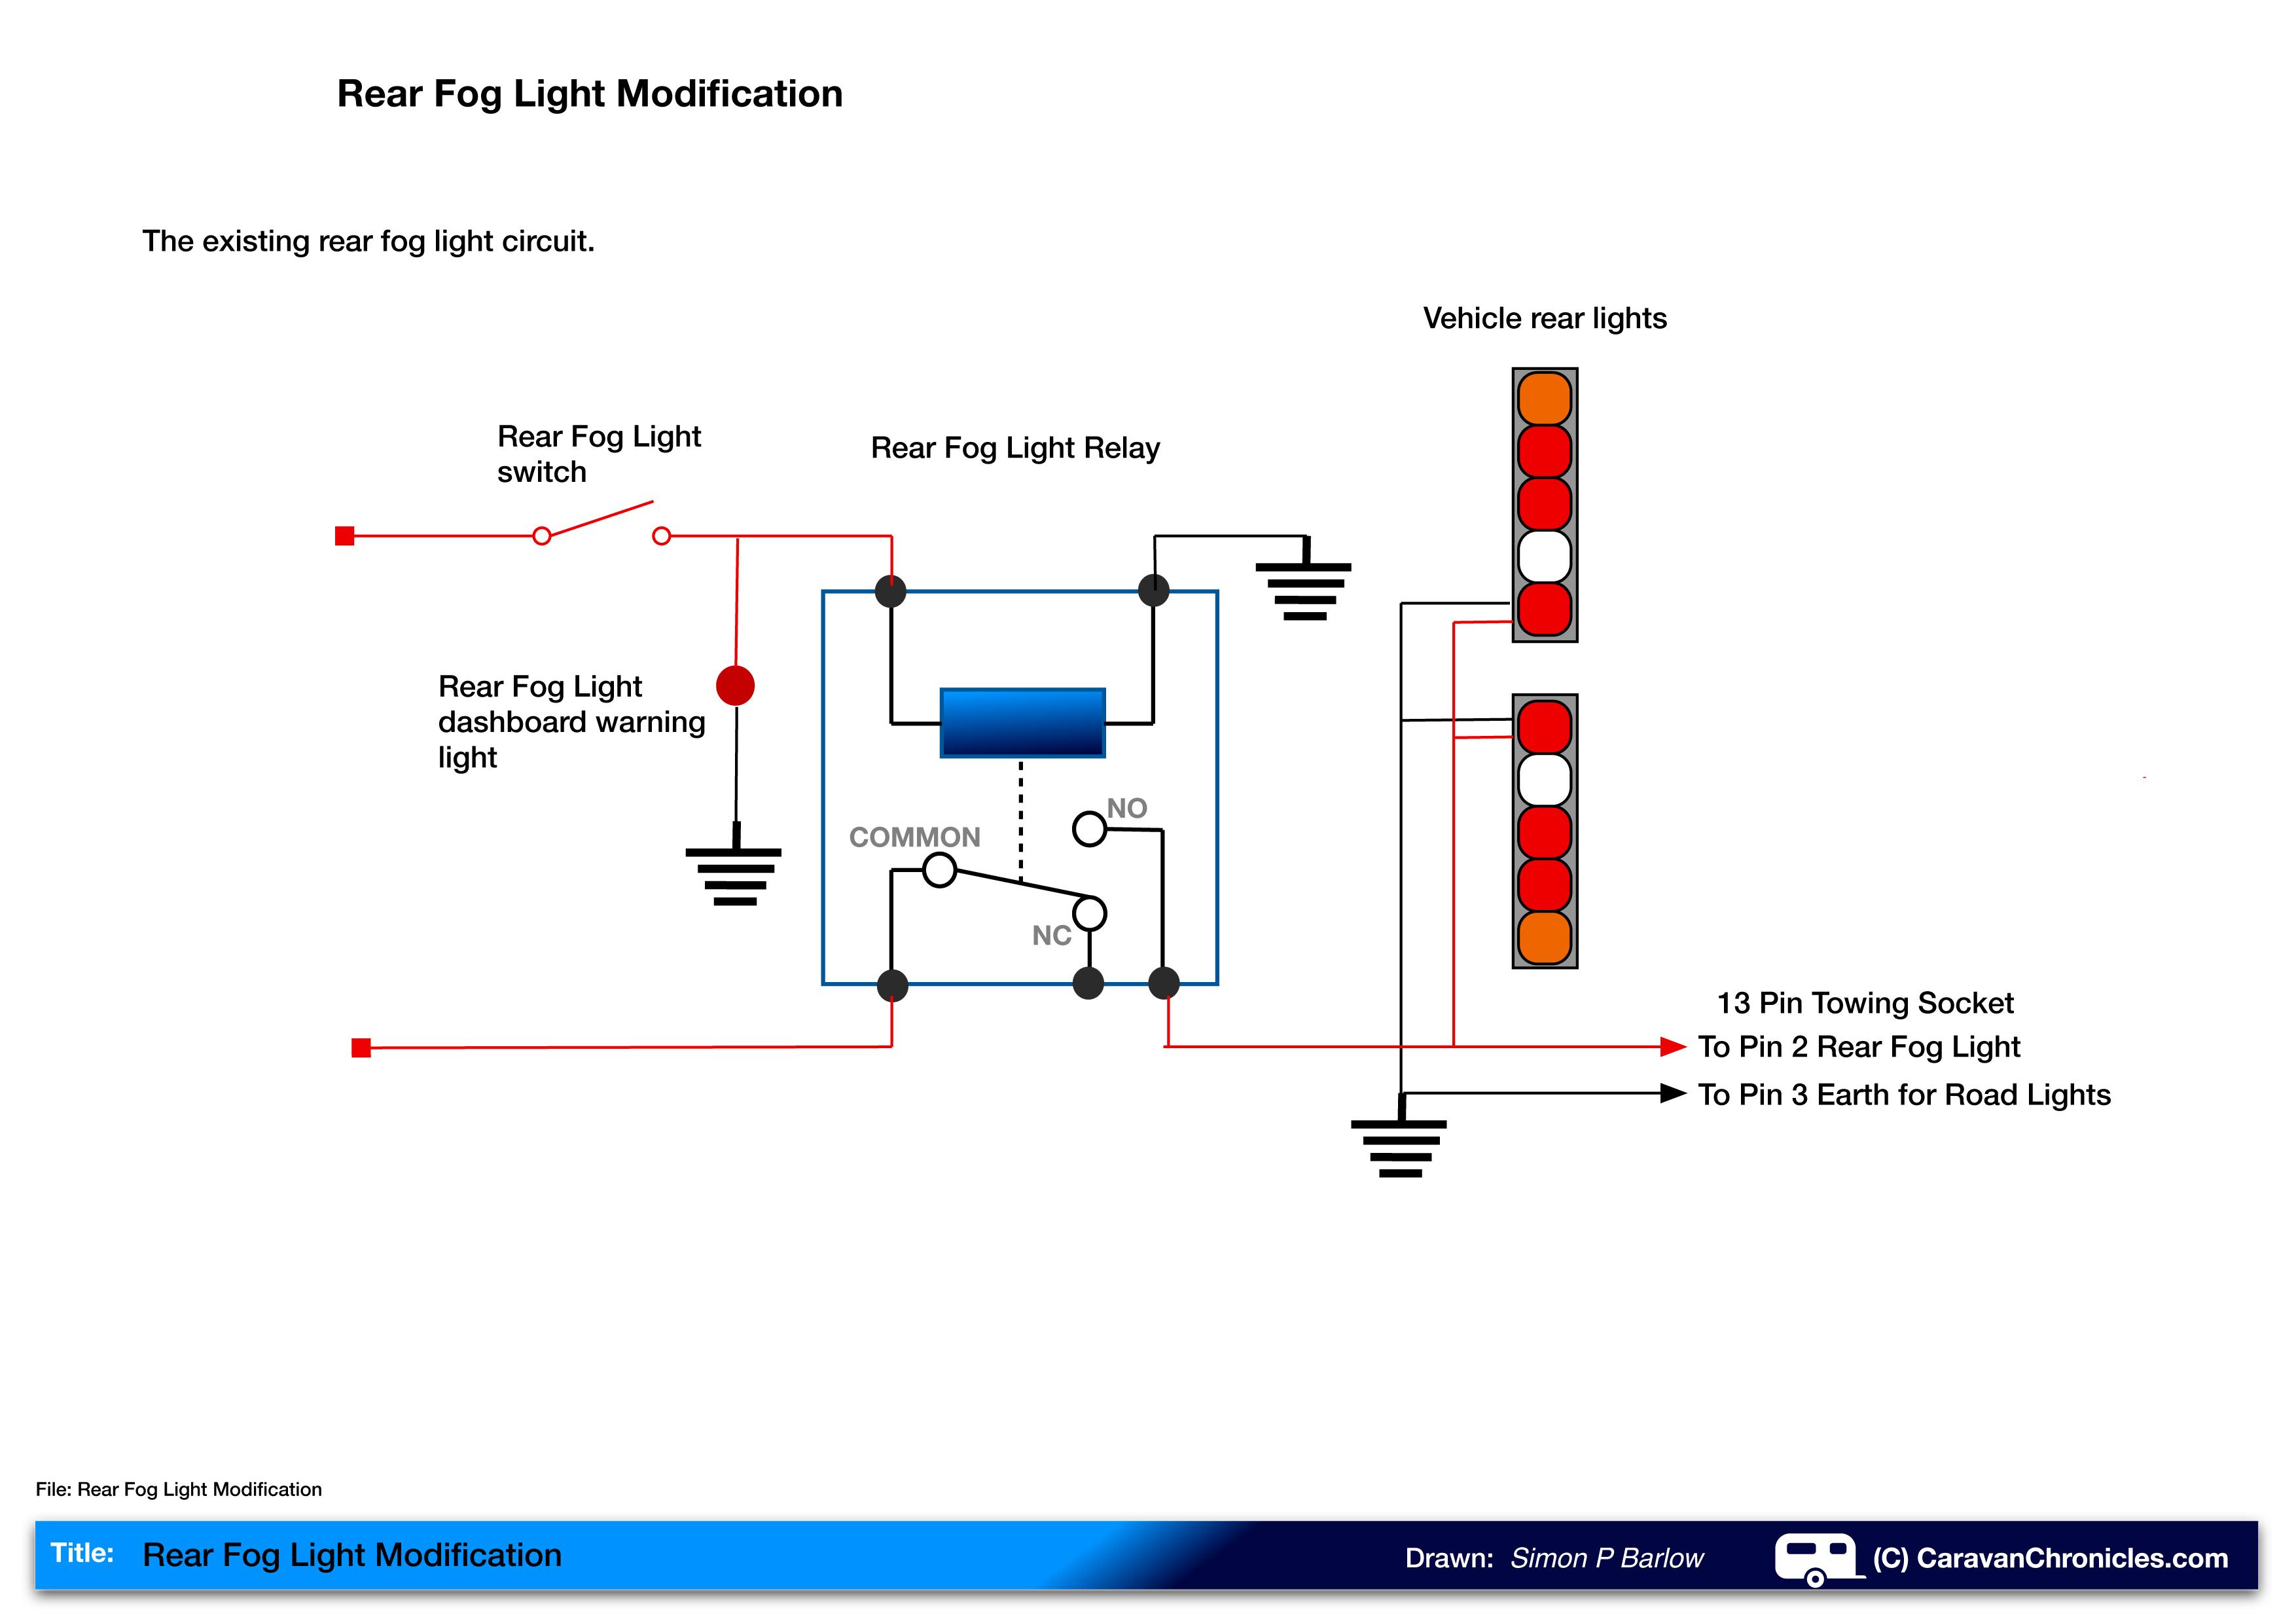 7 Prong Trailer Plug Wiring Diagram Blade Smart Diagrams